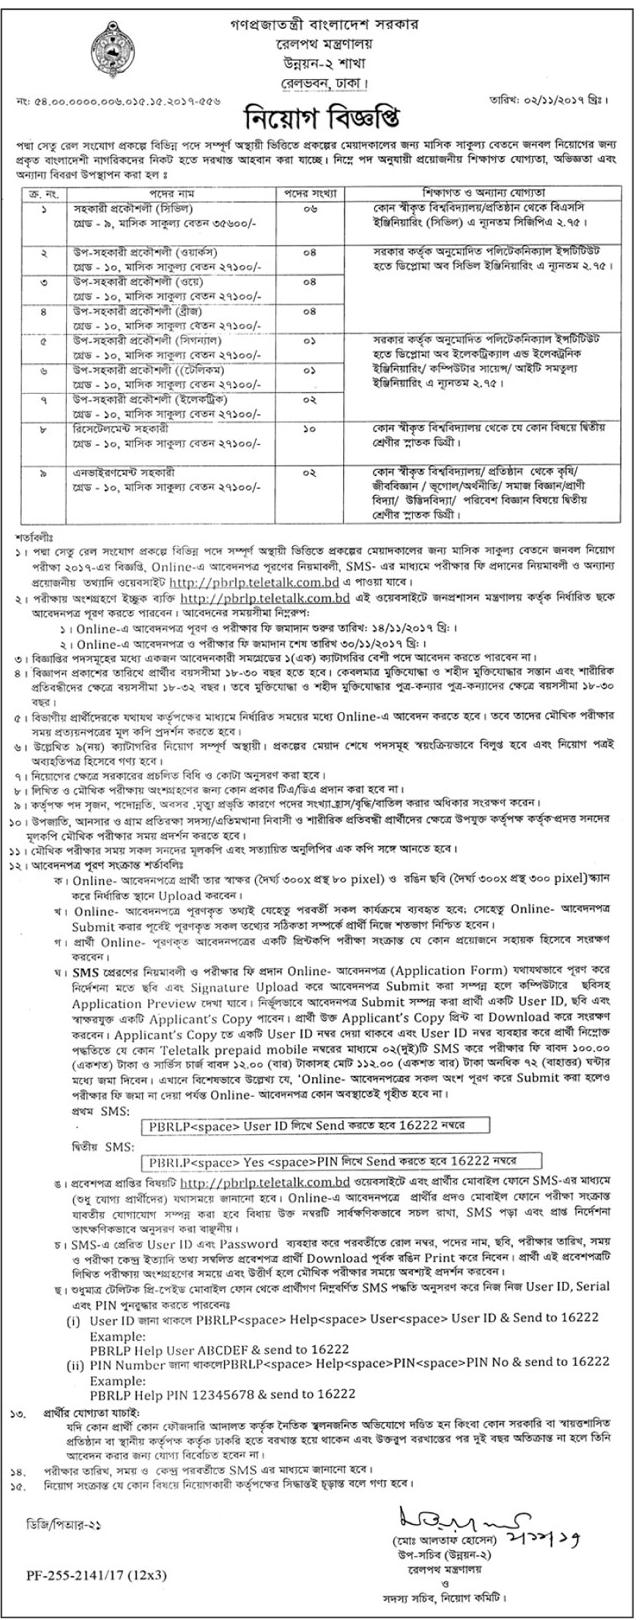 Ministry Of Railways Job Circular 2017